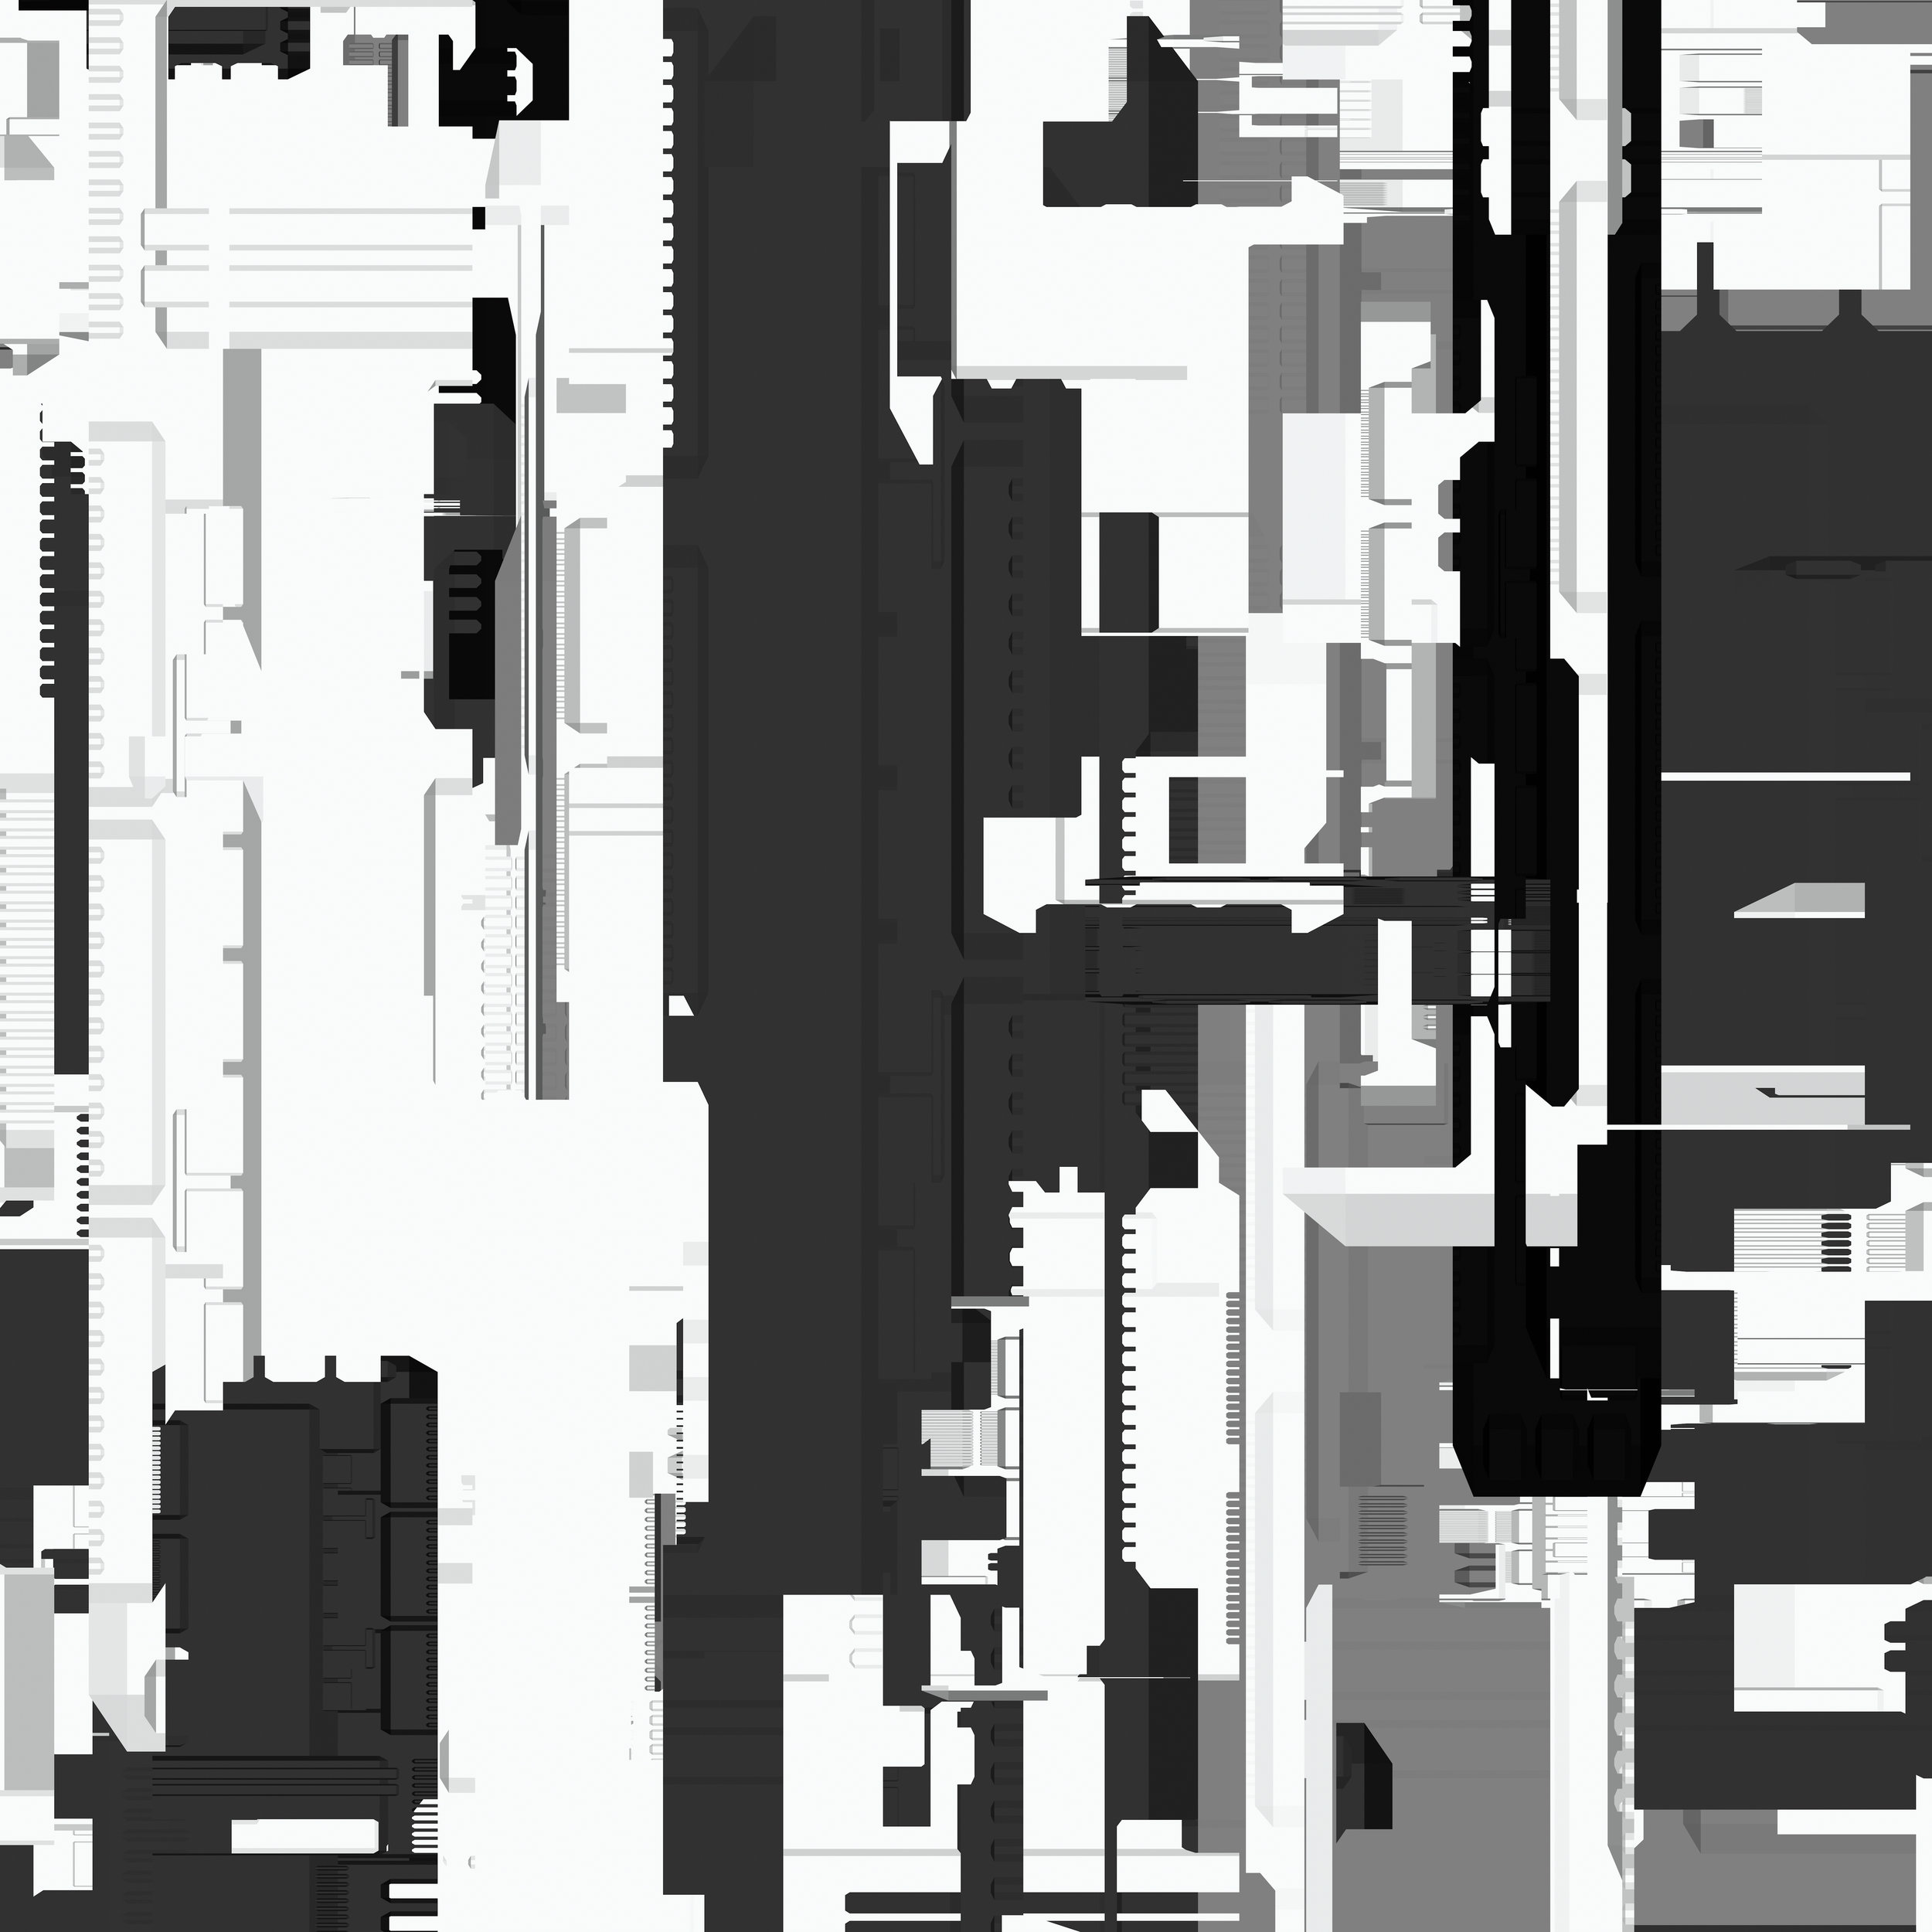 Techit-BM-093.jpg